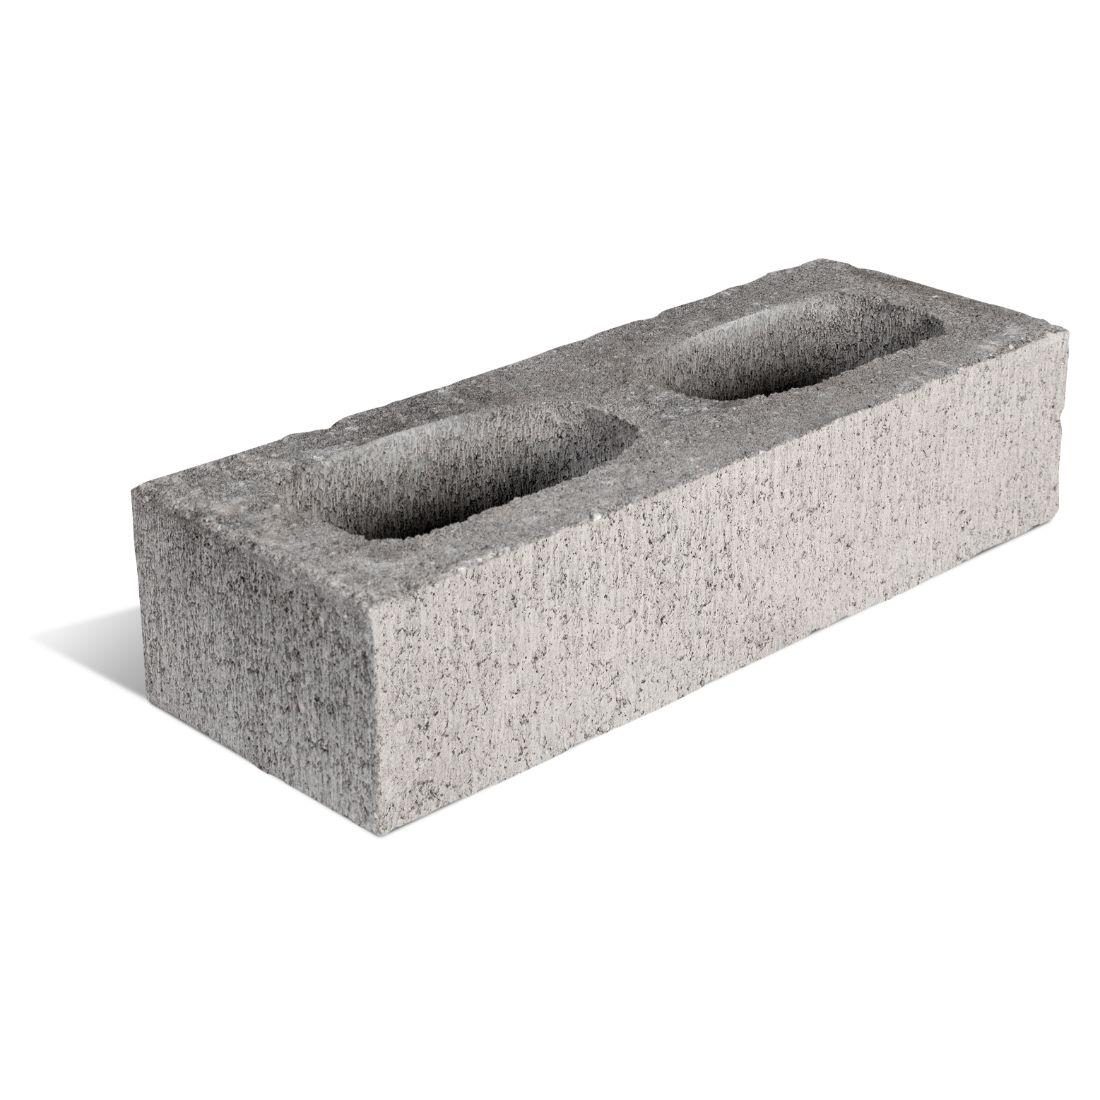 H15.04 Plain End Half High Standard Block 390 x 140 x 90mm